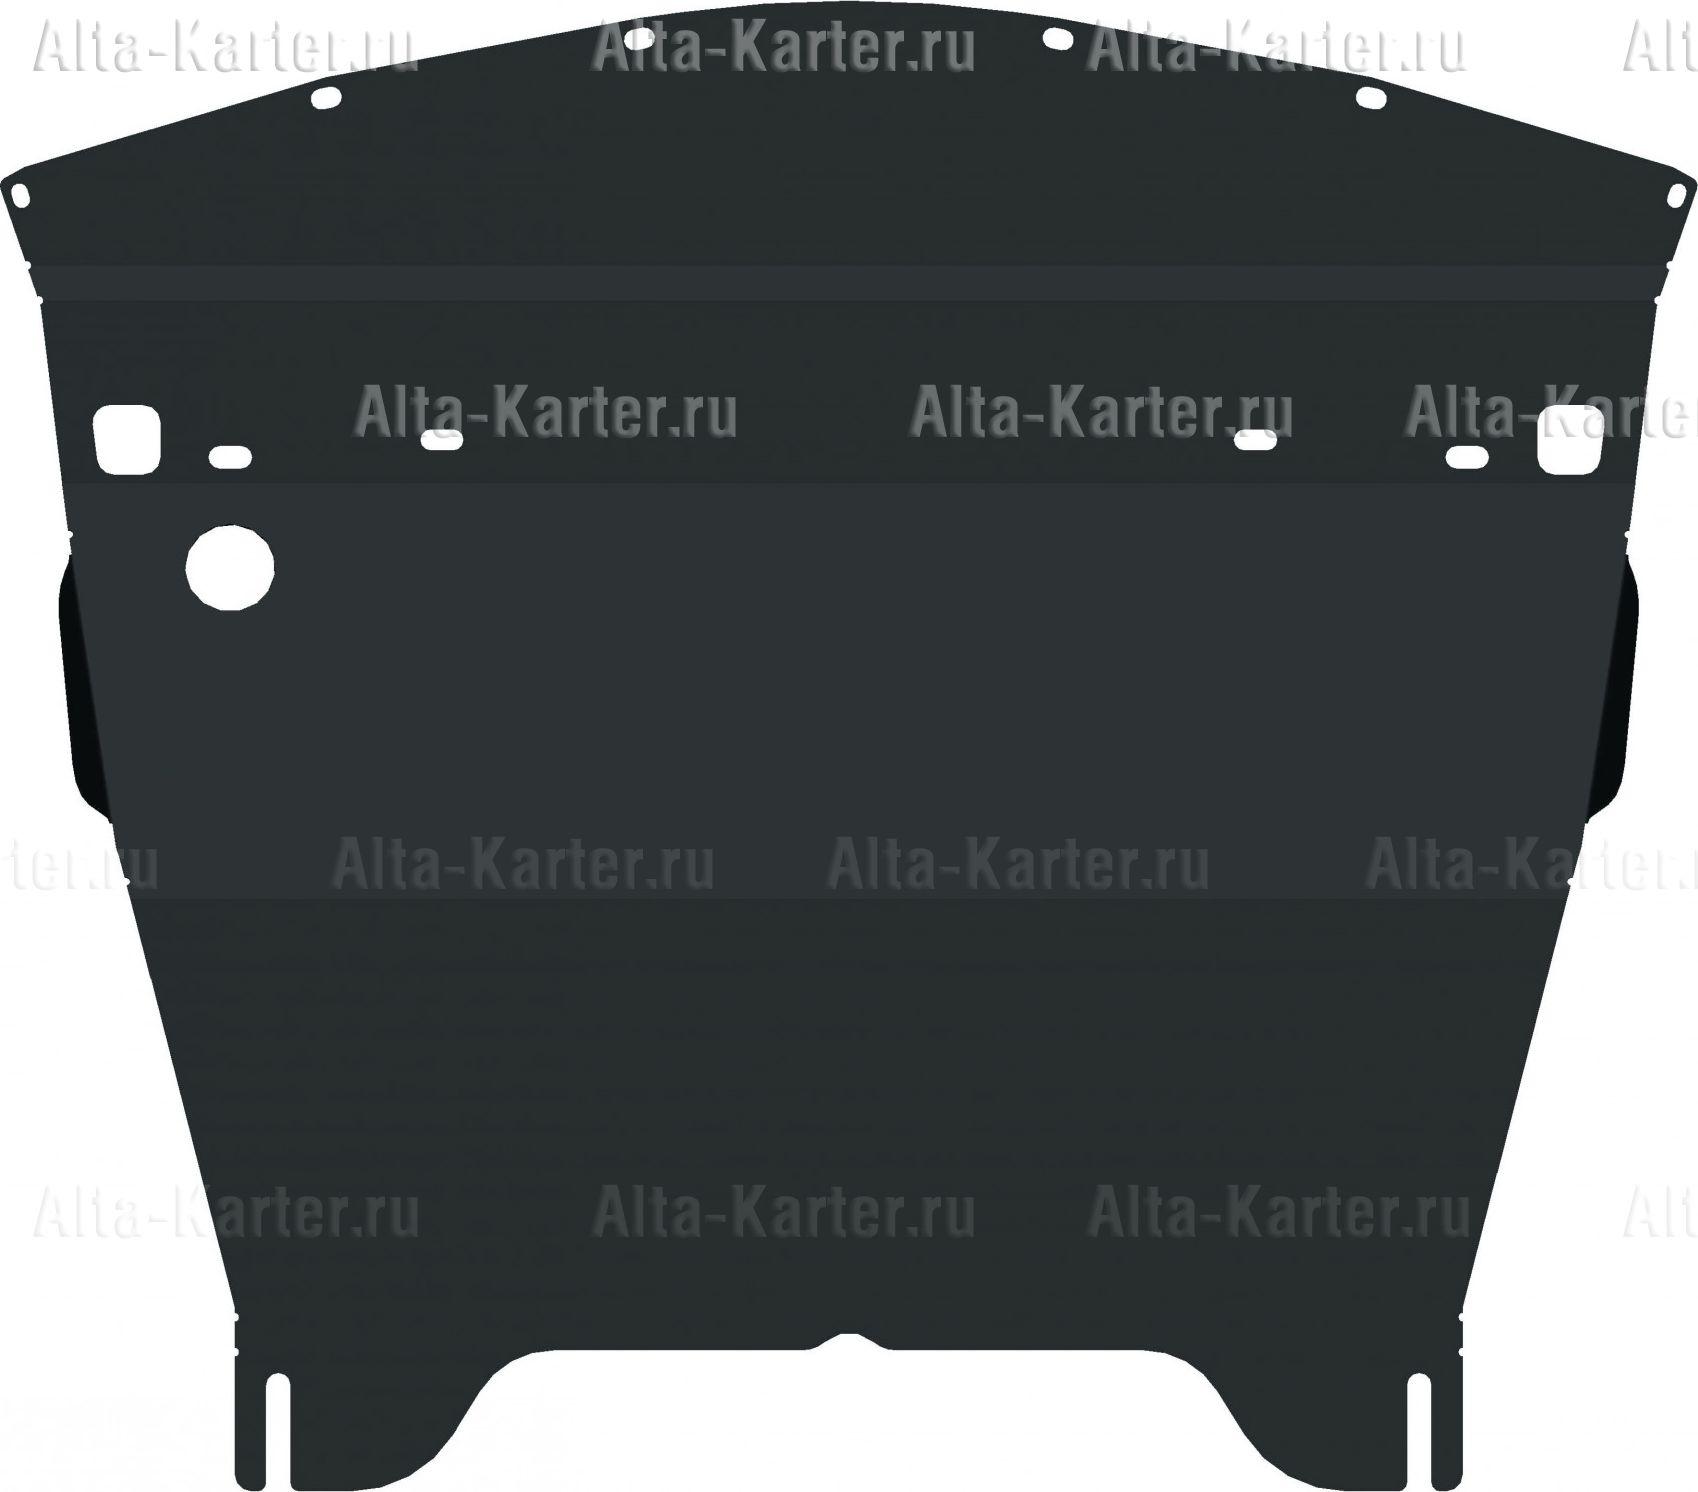 Защита Alfeco для картера Infiniti M25 2010-2013. Артикул ALF.29.17